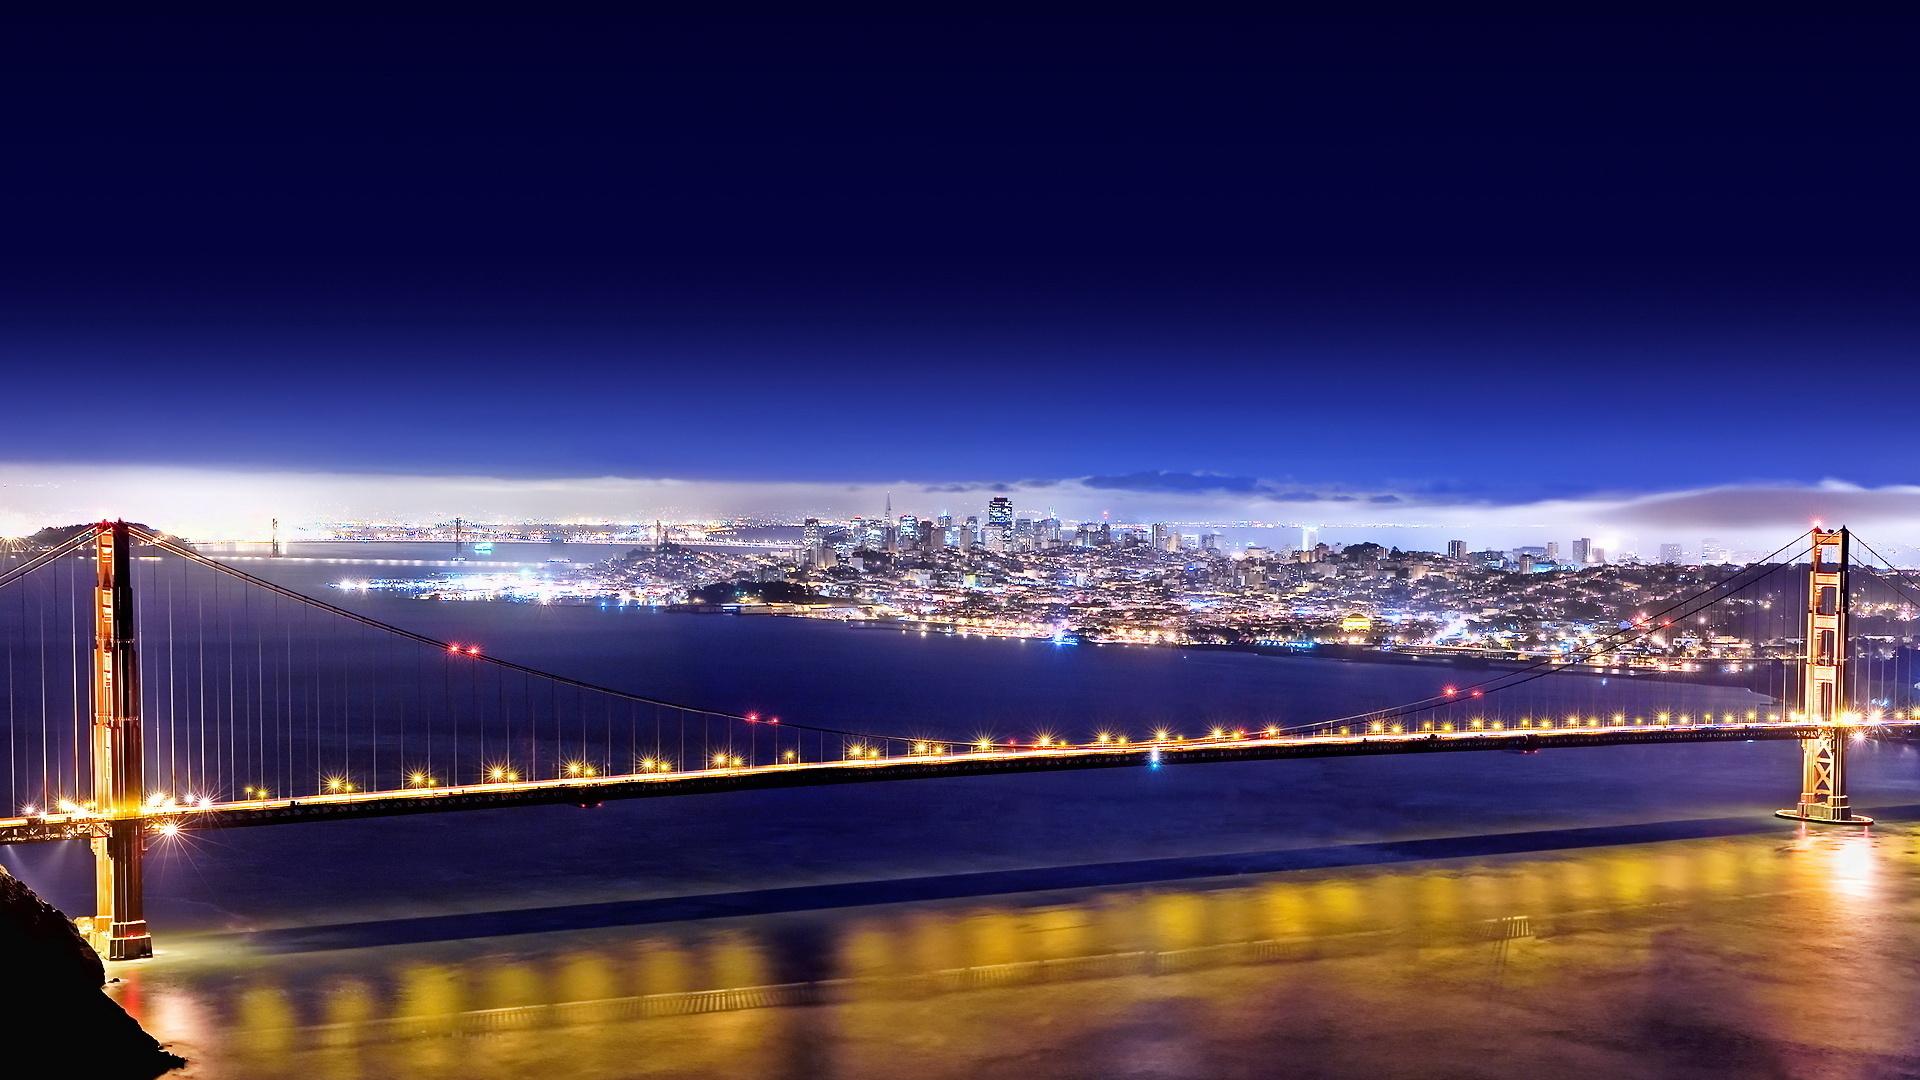 Wallpaper Golden Gate Bridge San Francisco night City Wide 1920x1080 1920x1080